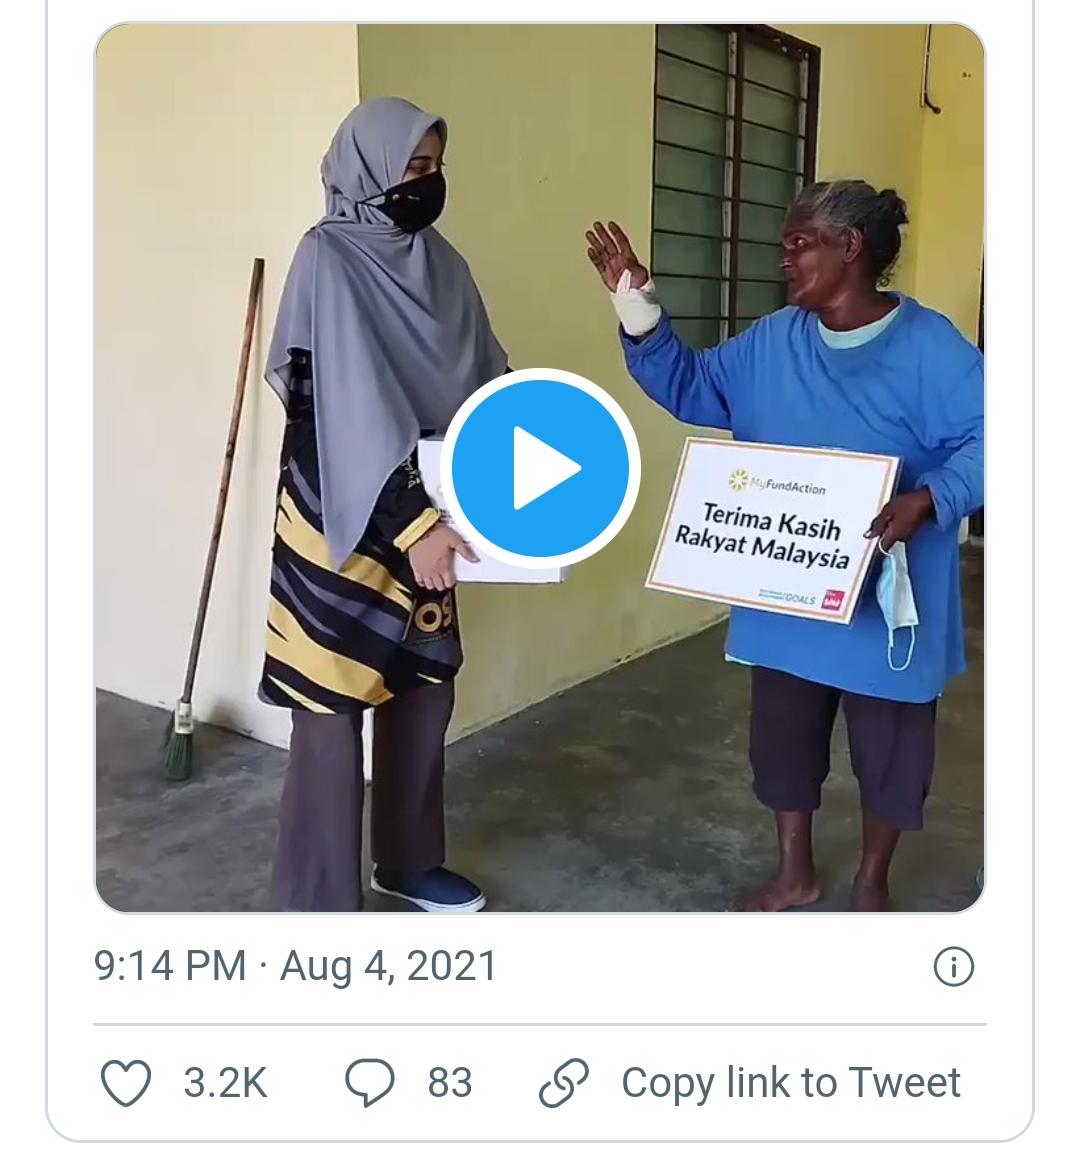 Video: Hanya Berbekalkan Nasi Lauk Garam, Sampai Hati Bagi Upah RM10 Cuci 2 Rumah